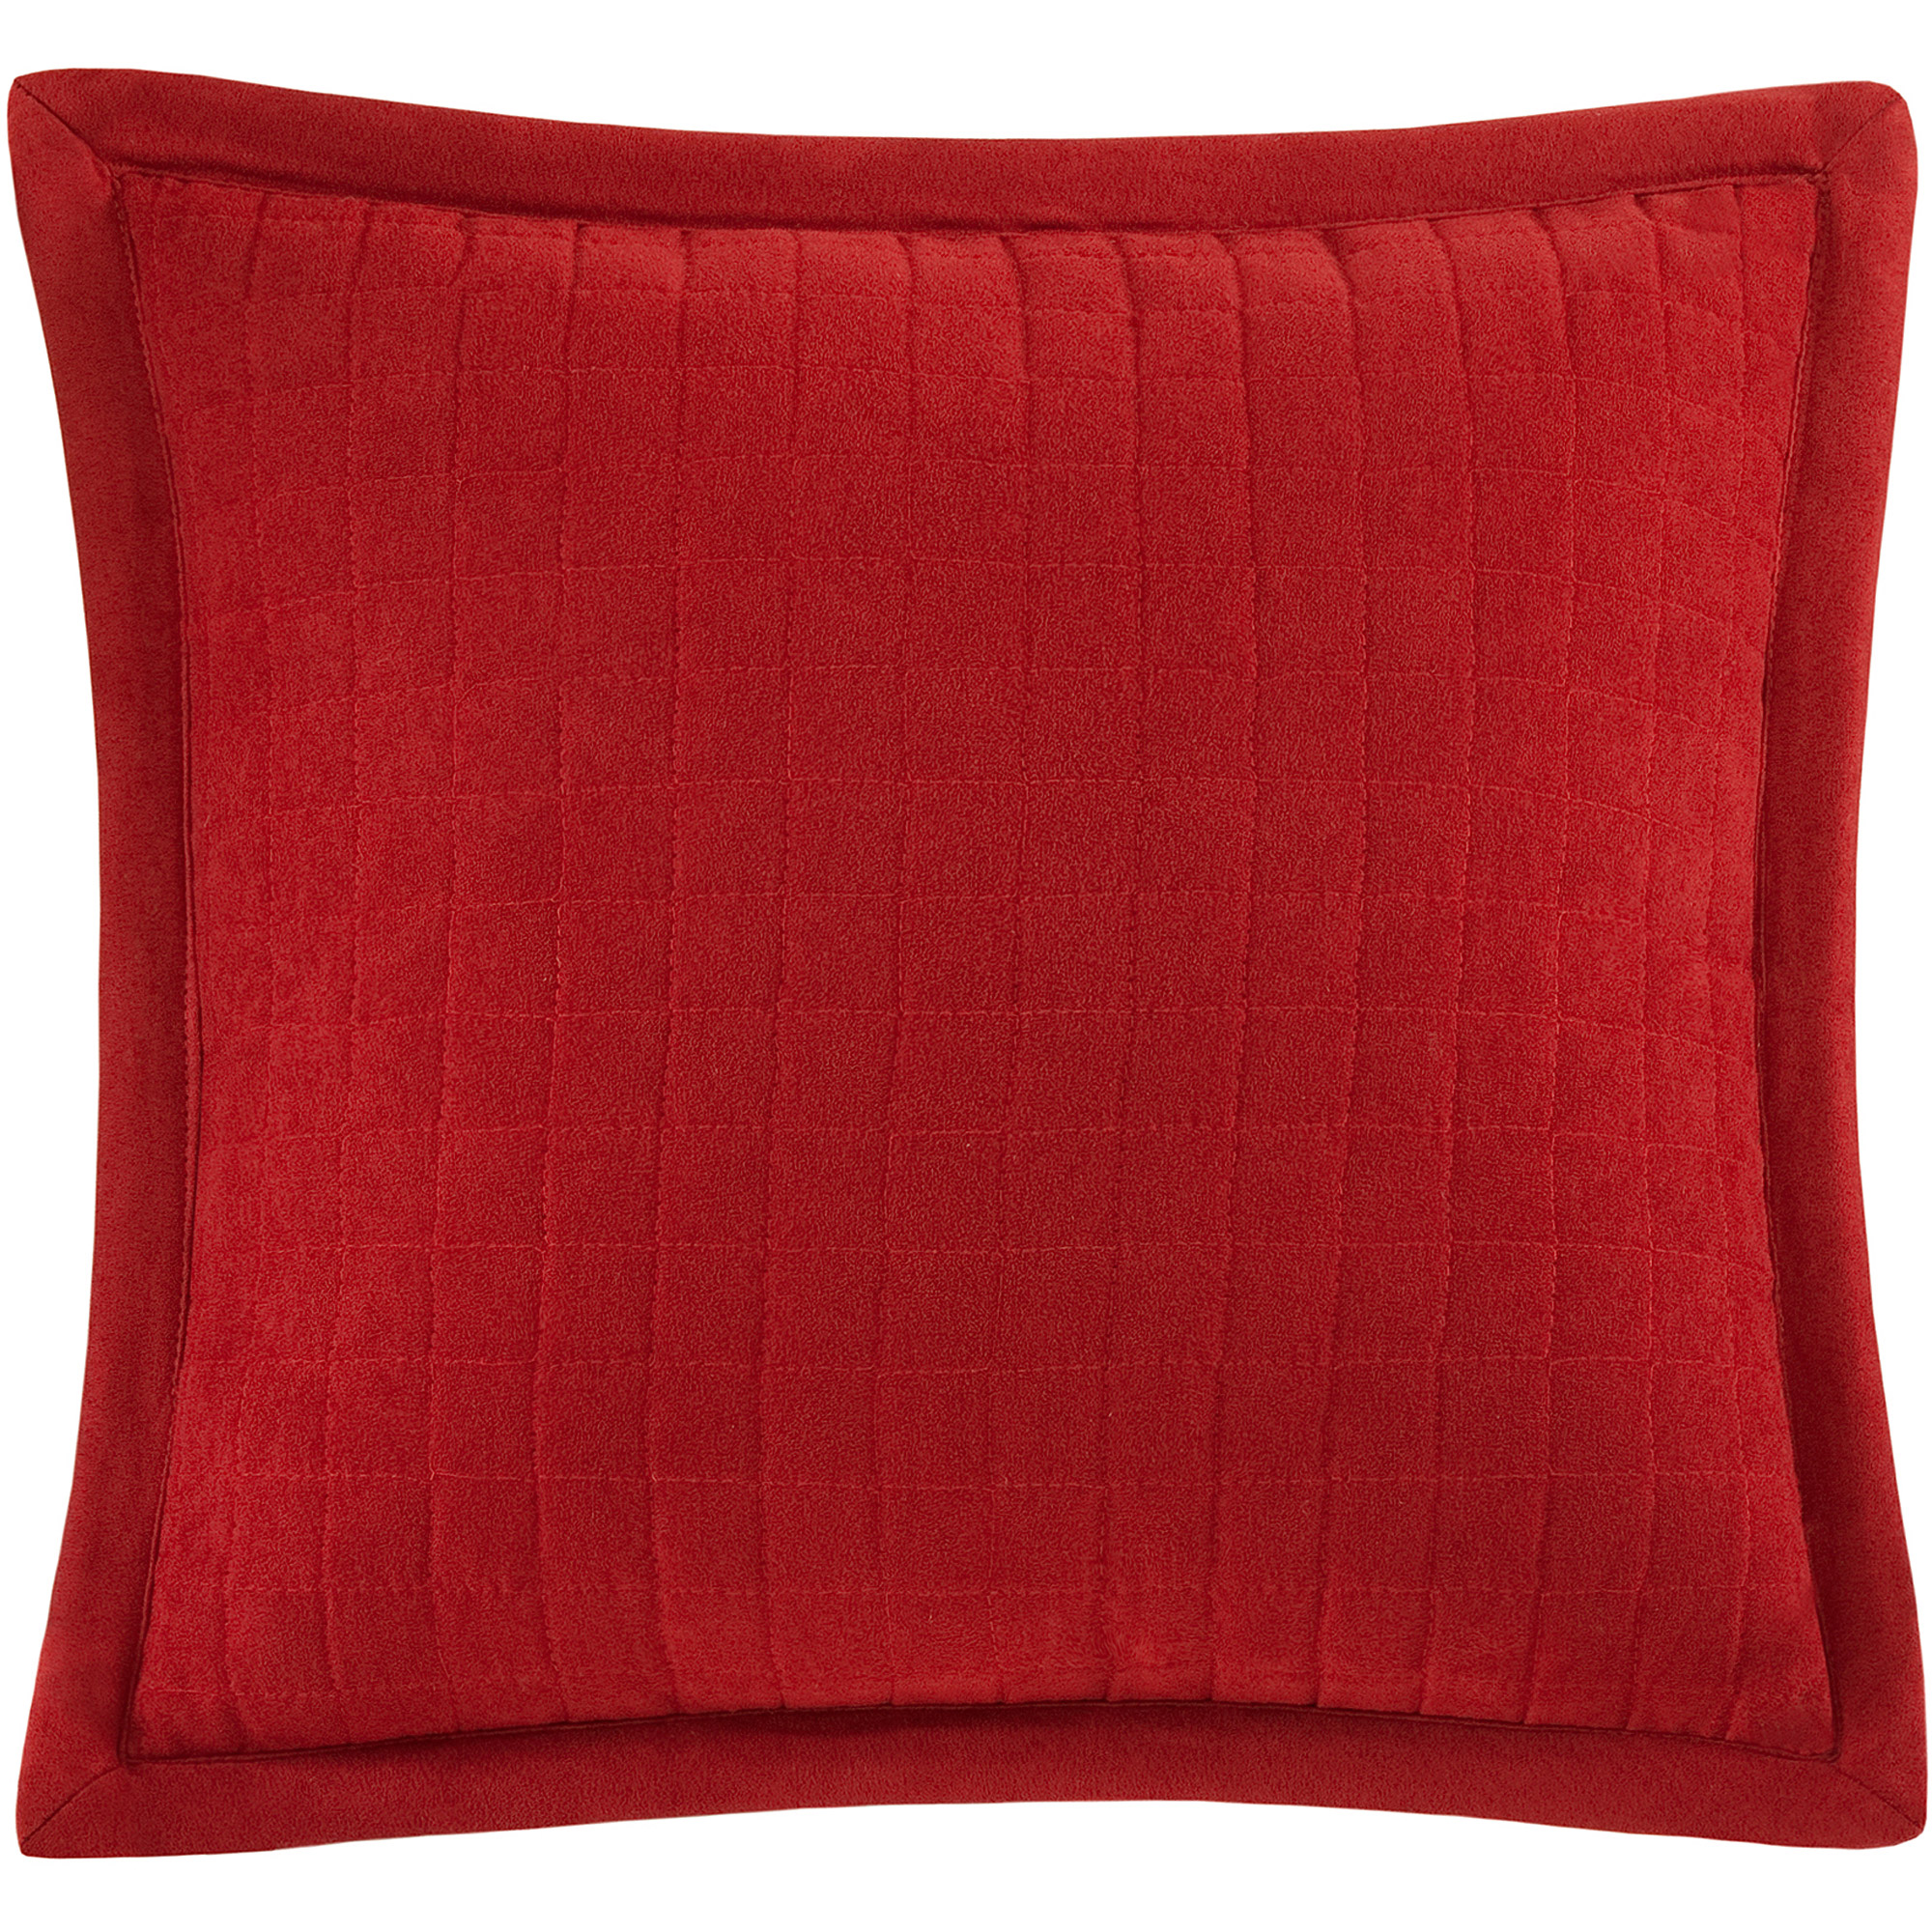 Mainstays Broken Corduroy Collection Oblong Decorative Pillow